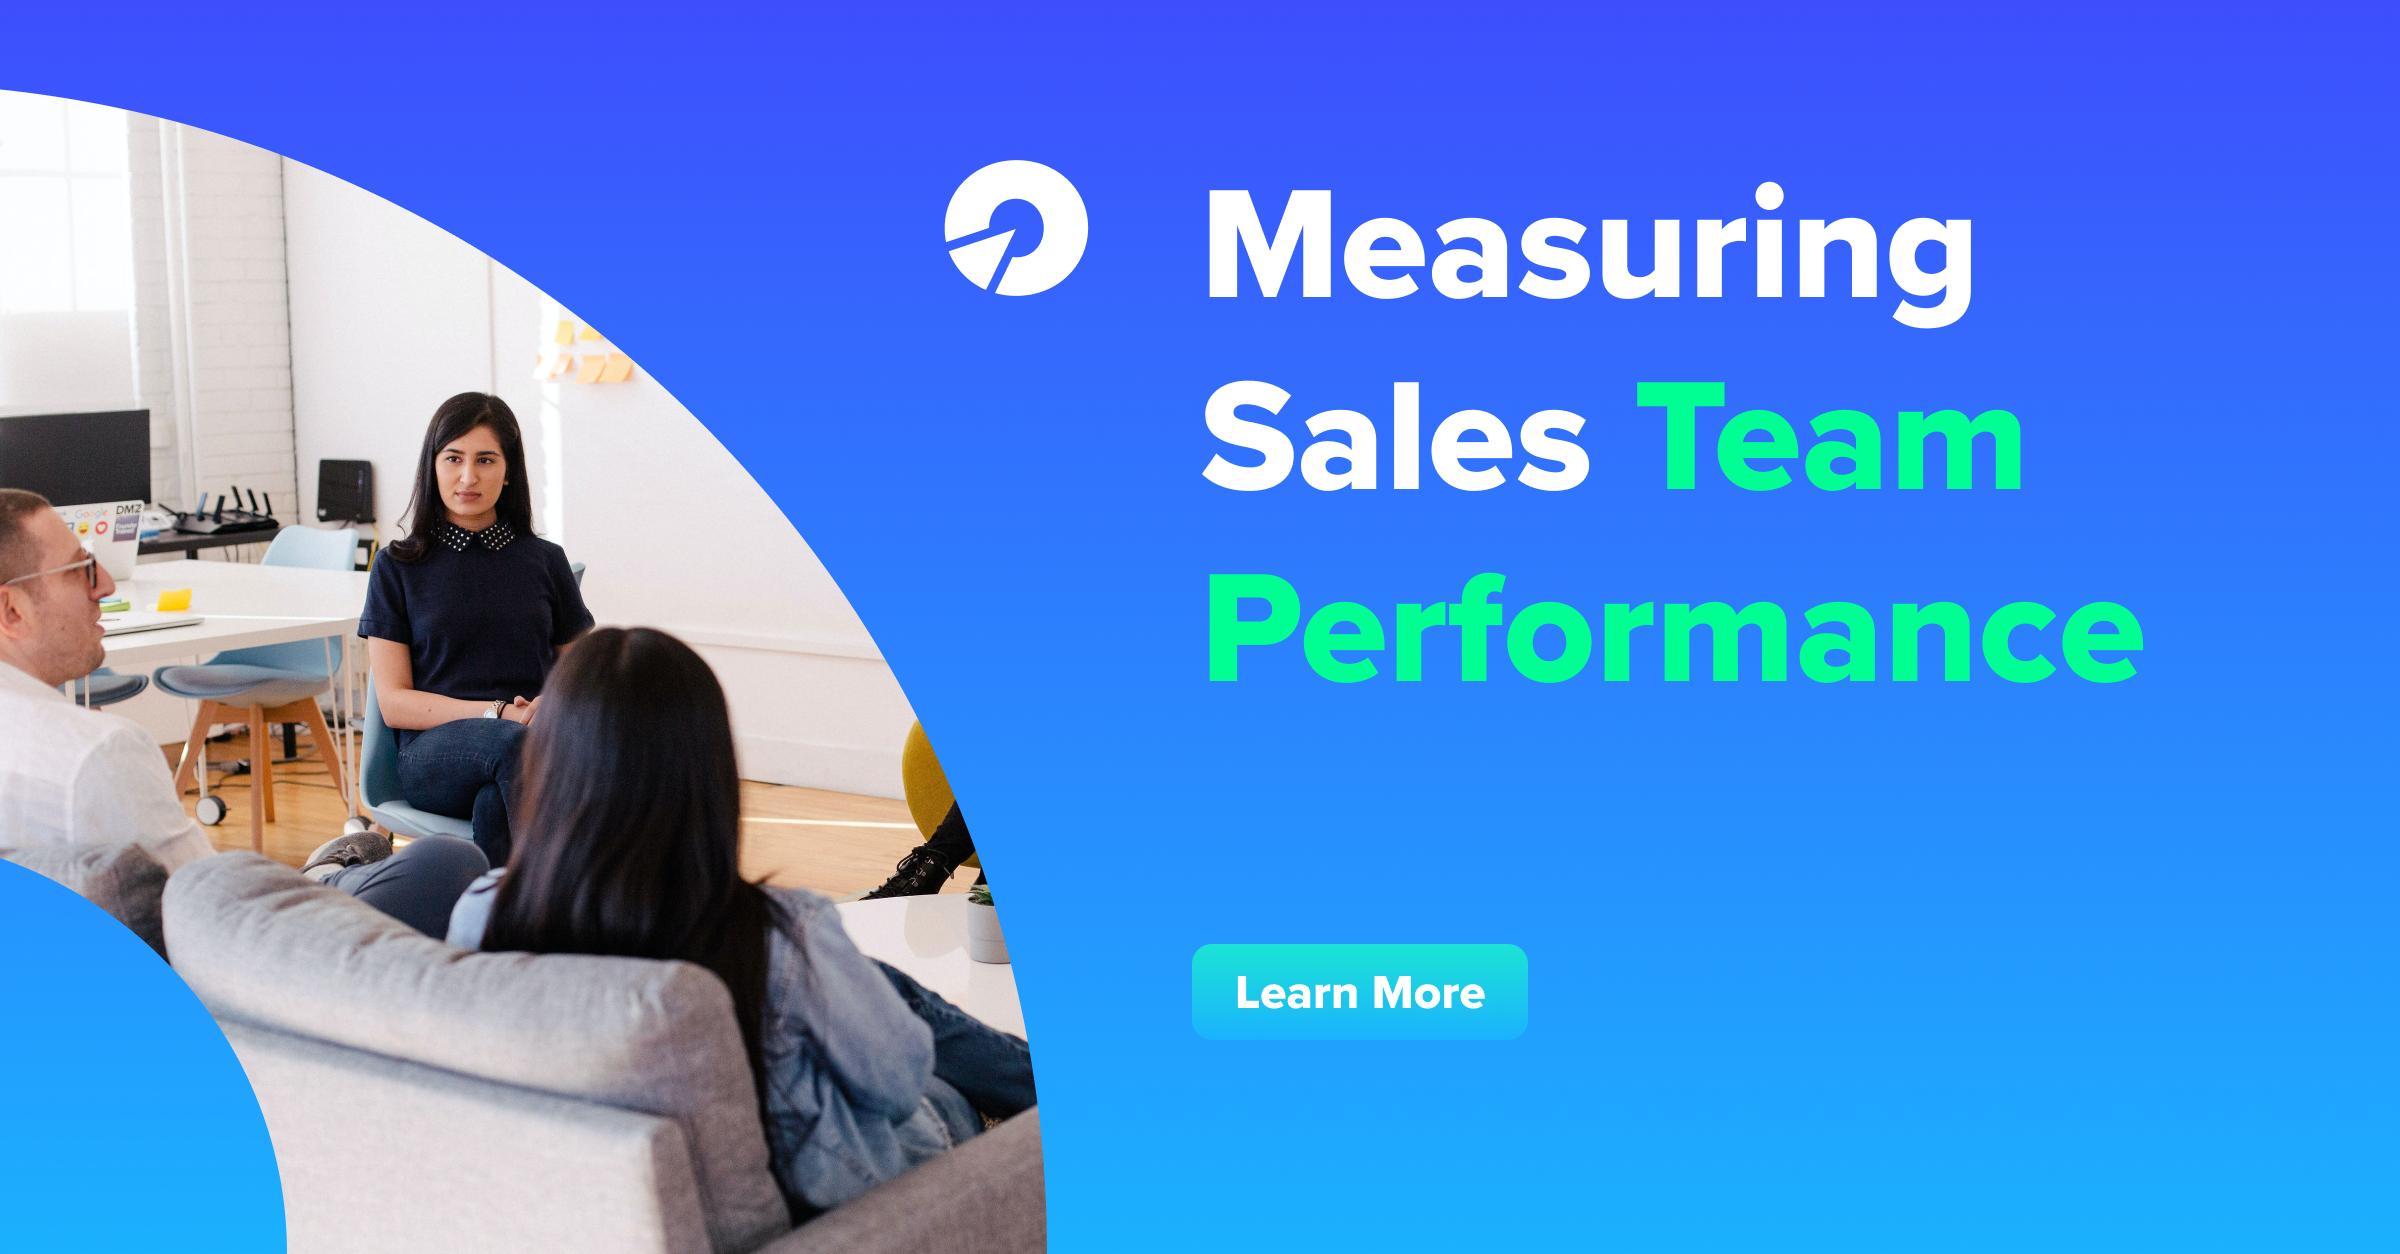 Measuring Sales Team Performance